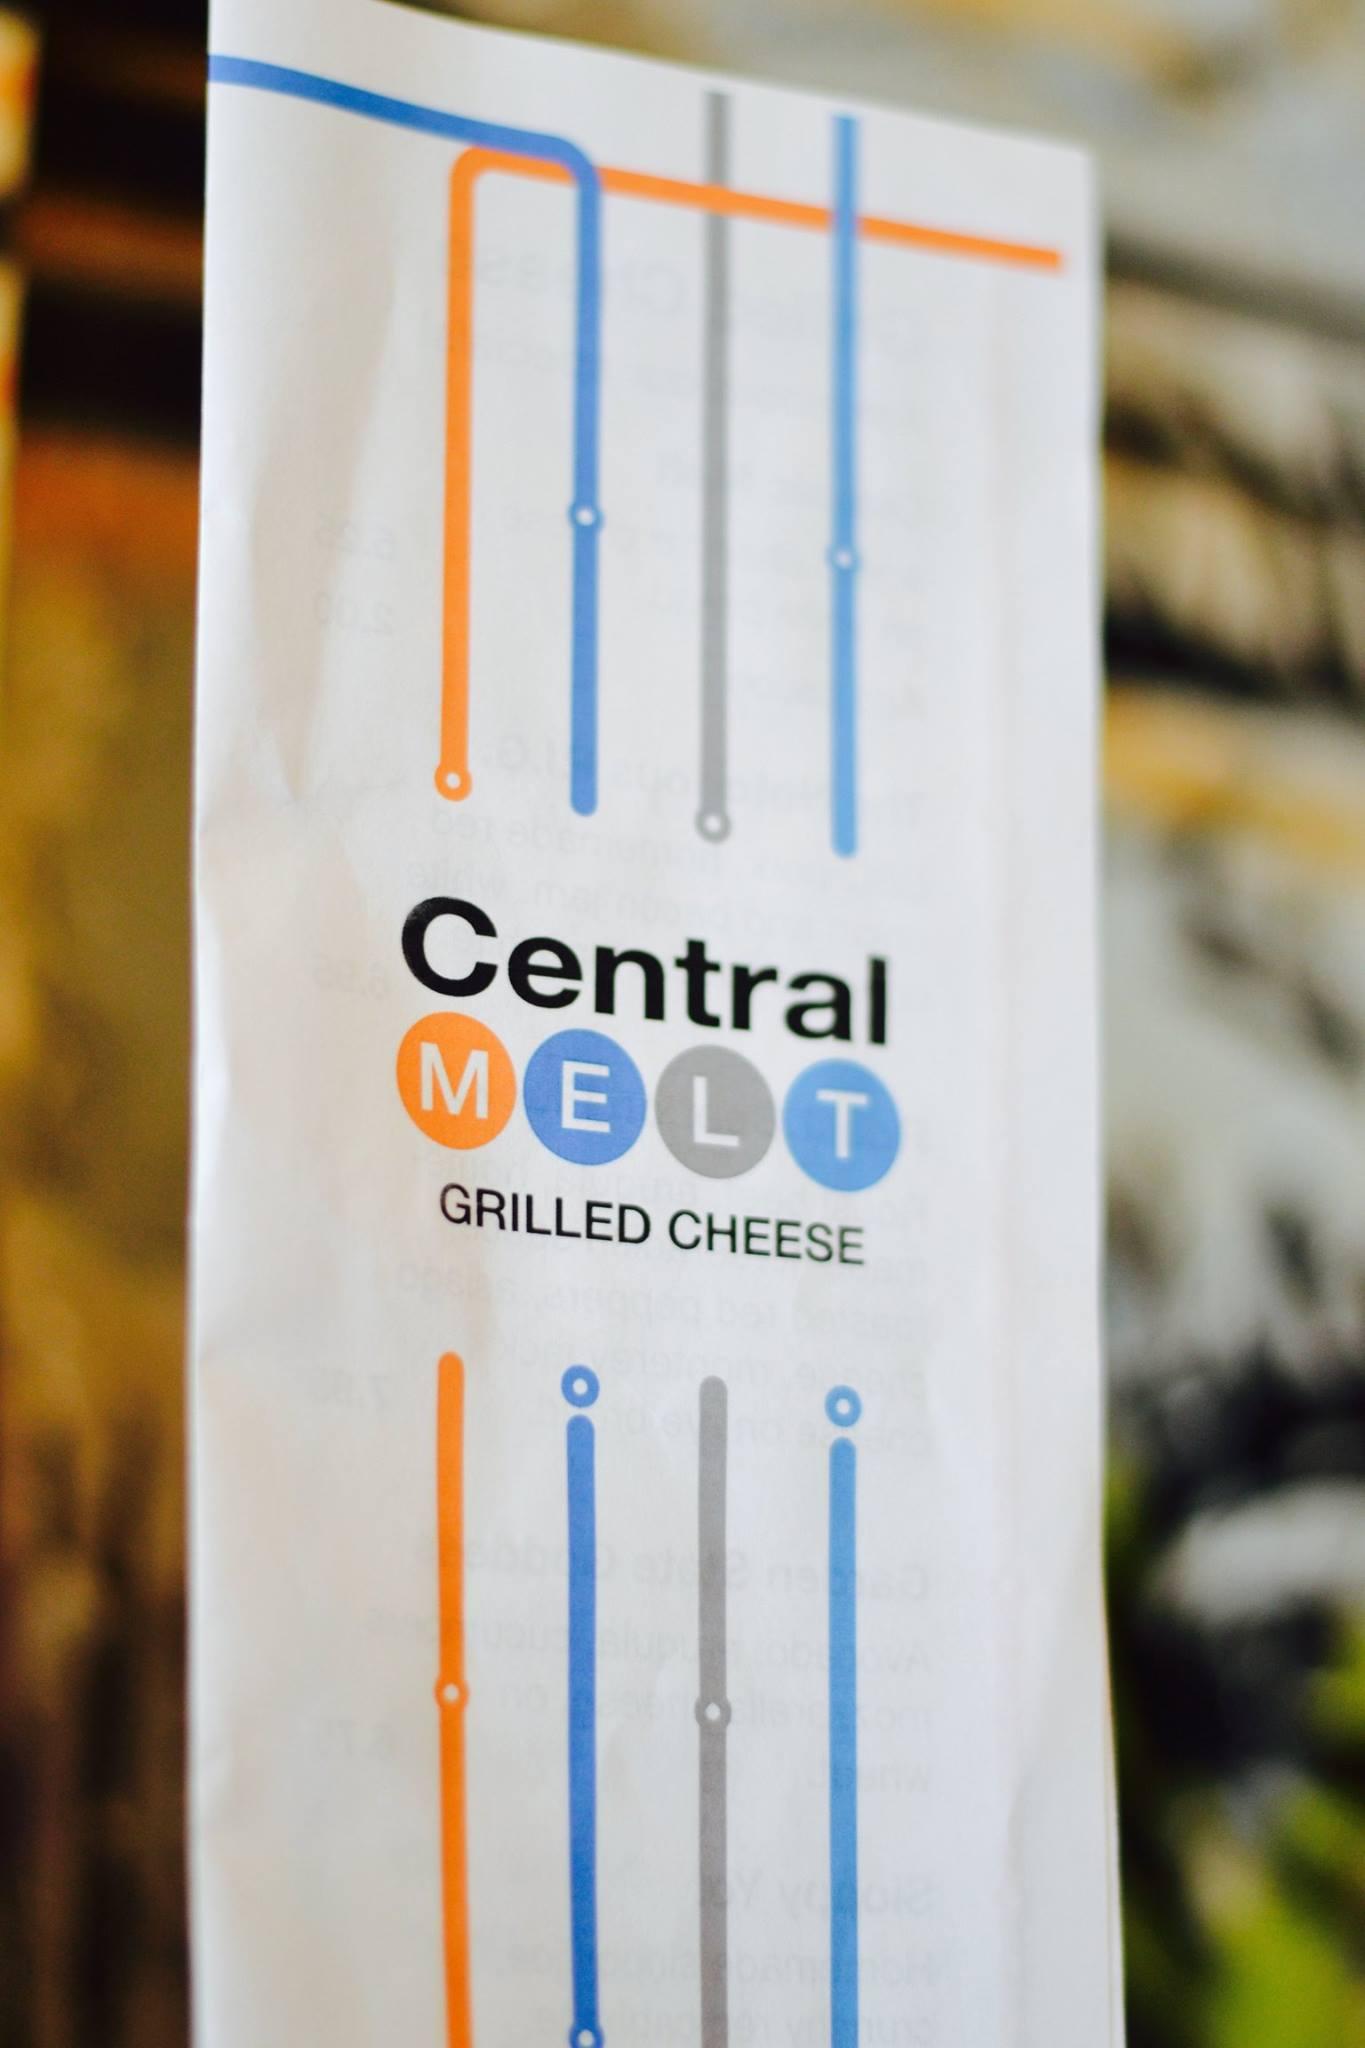 Central Melt: A Review